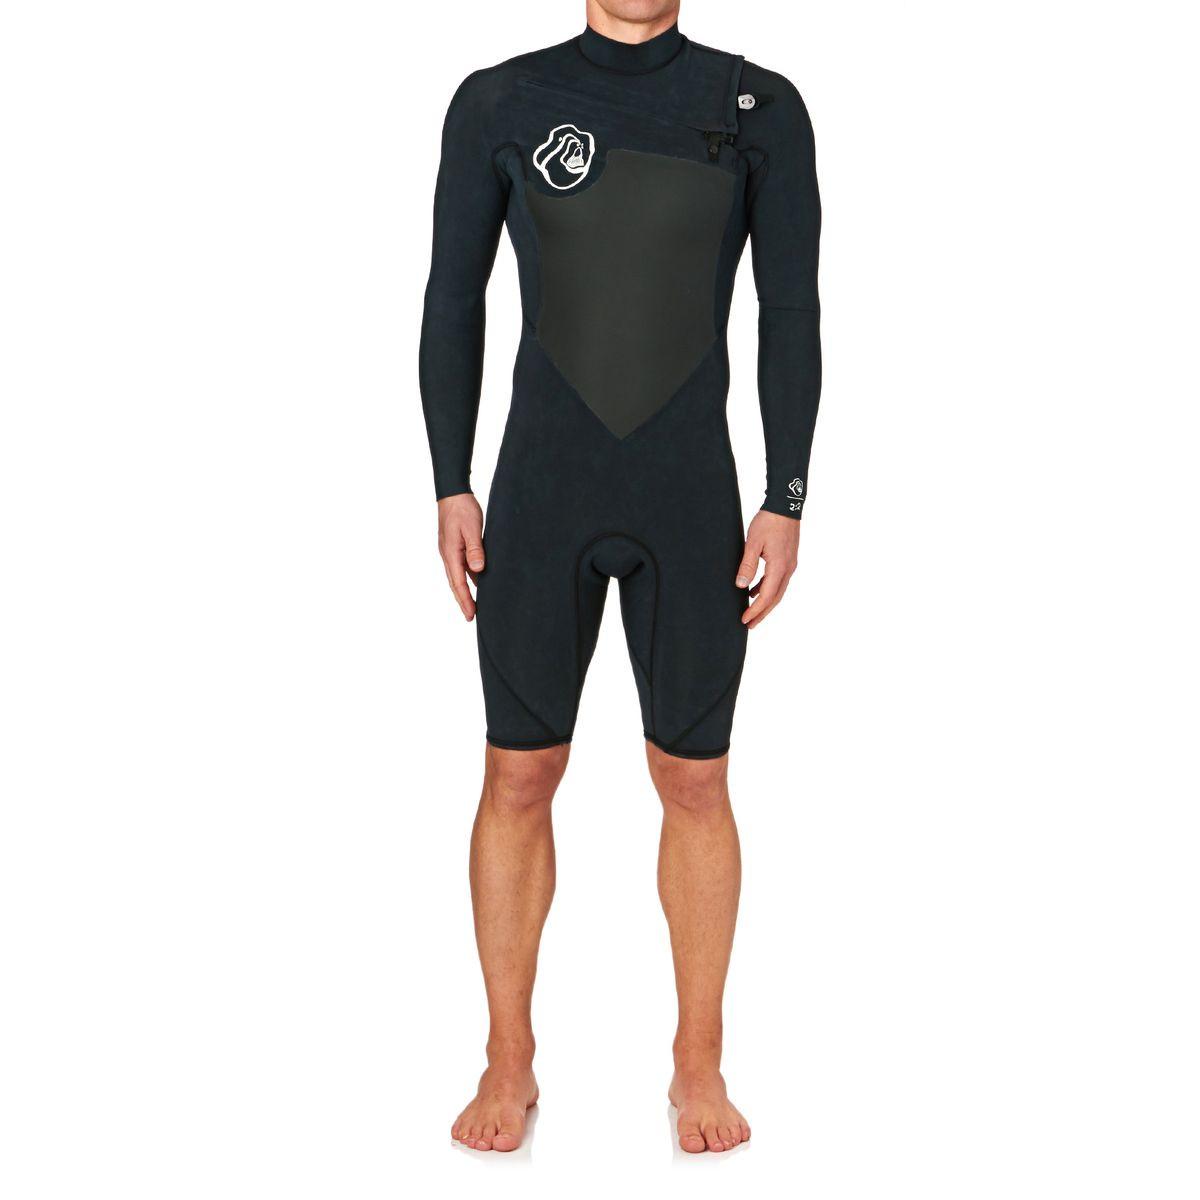 Quiksilver High Dye 2mm 2017 Chest Zip Long Sleeve Shorty Wetsuit - Black